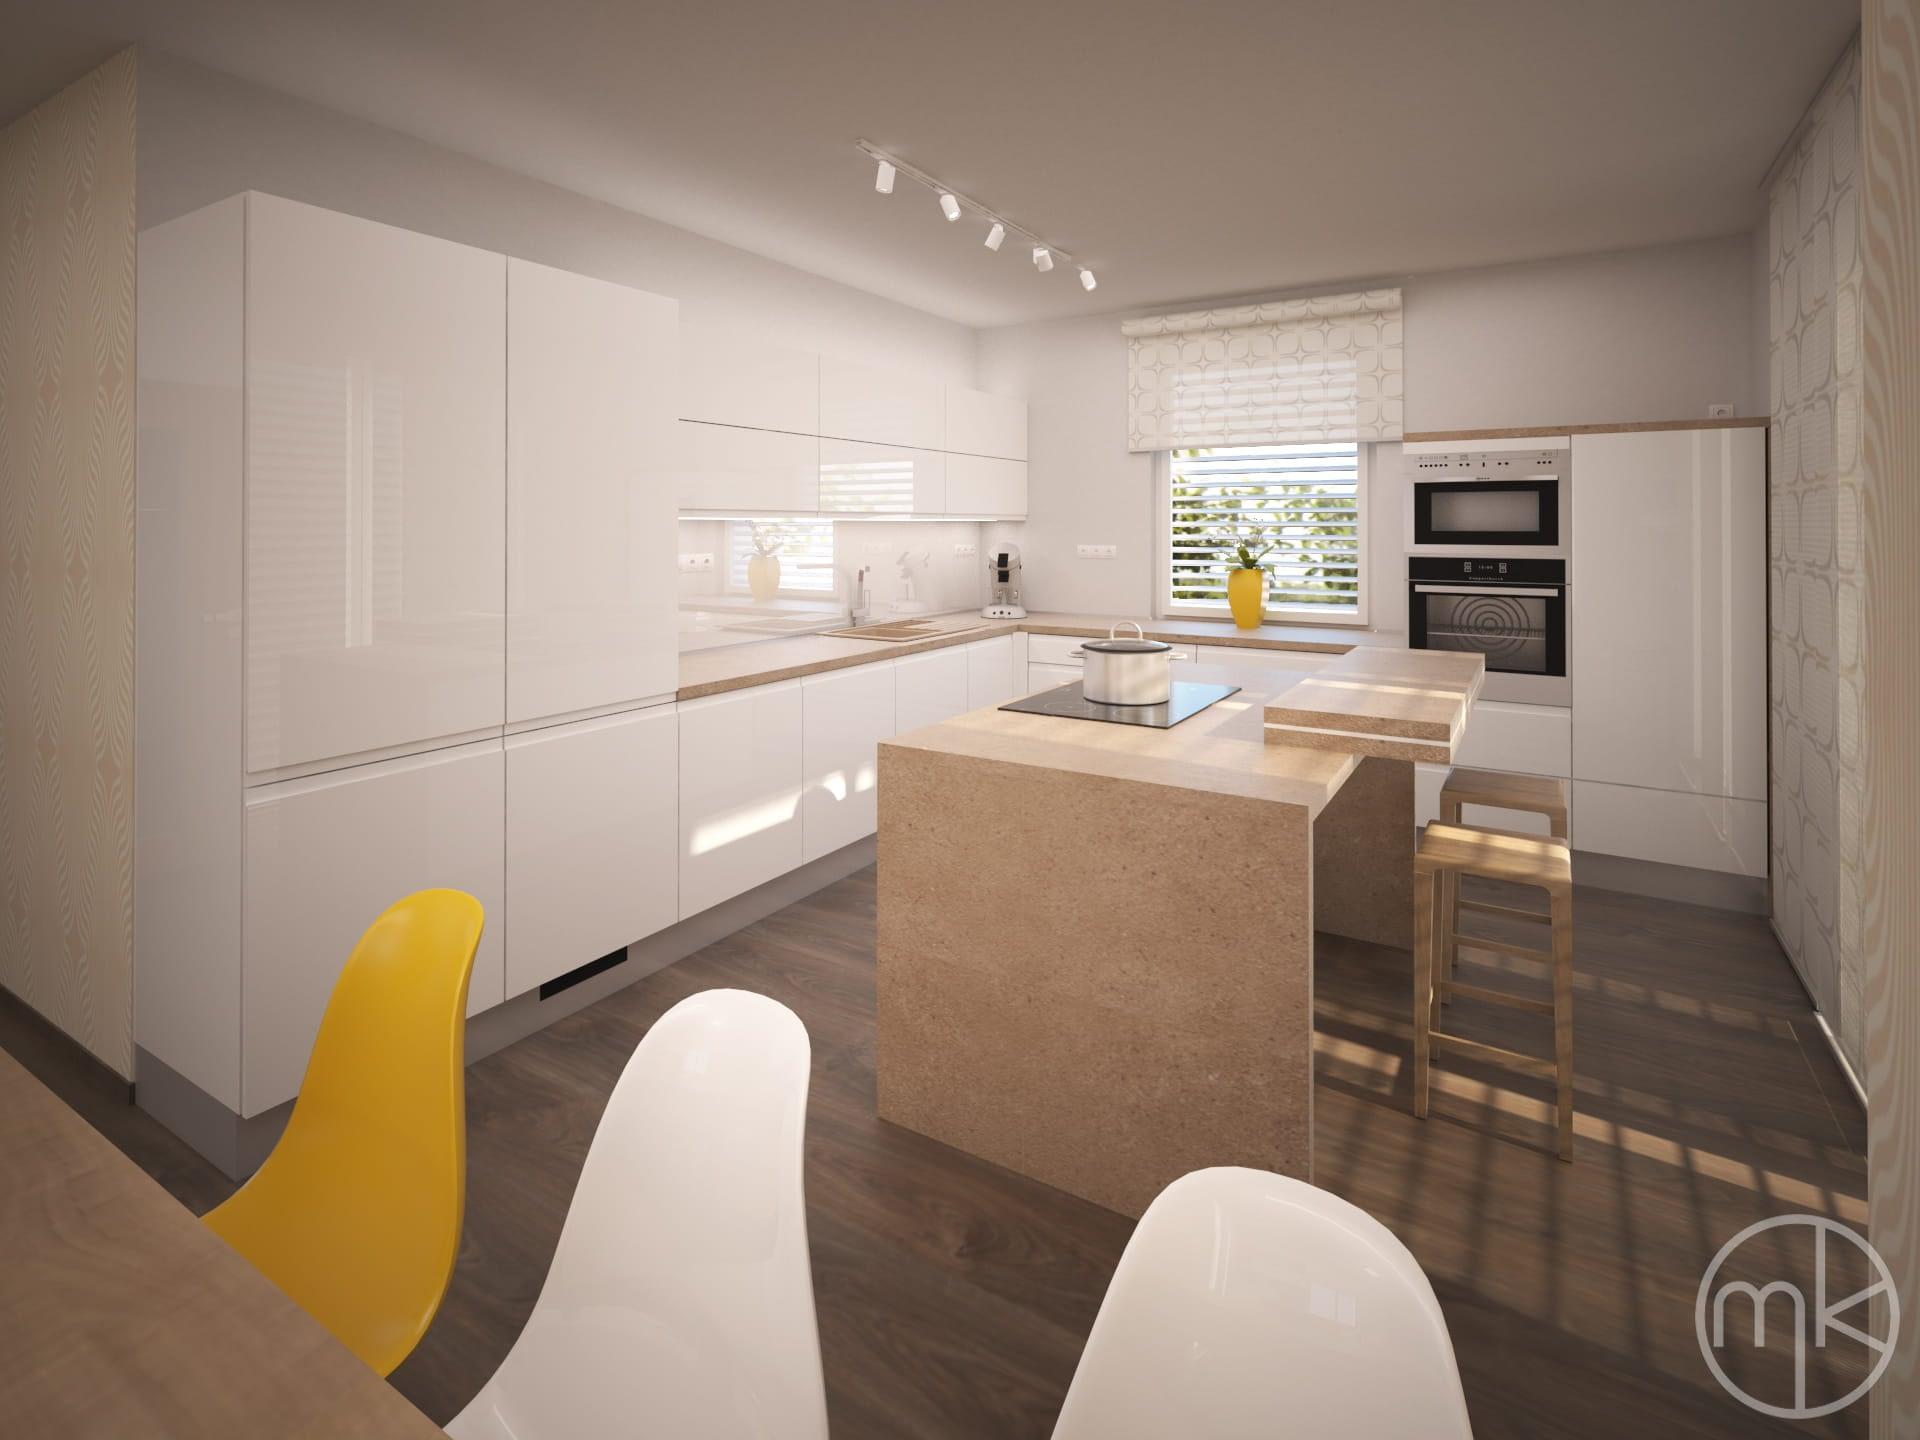 Kuchyň v bílém lesku